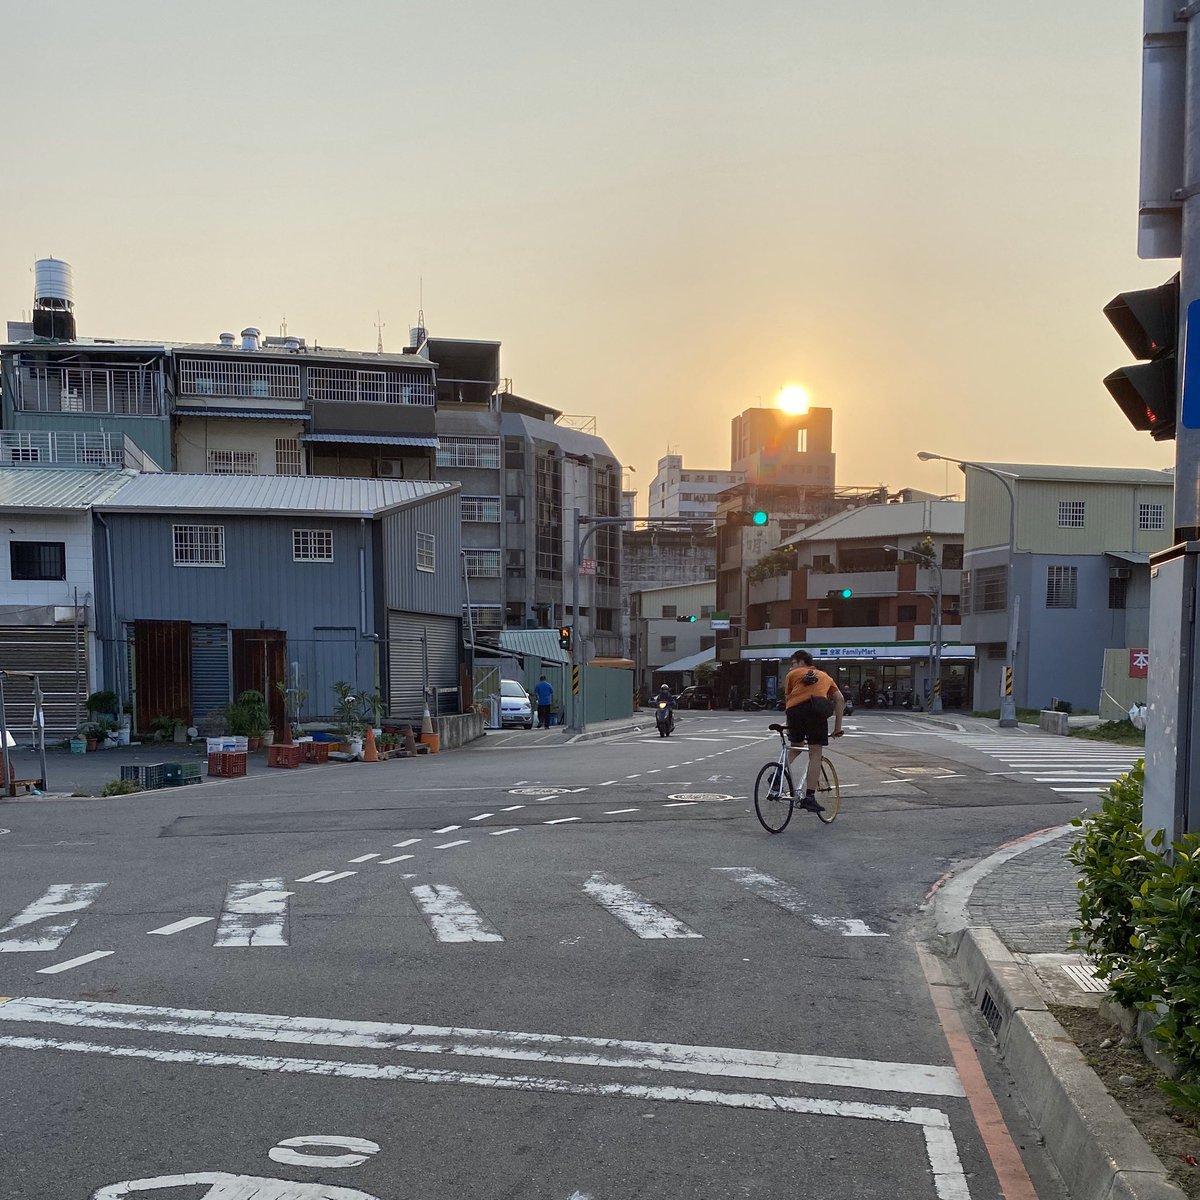 Riding to the Sunset. #riding #sunset #ridelife #bikelife #fun #chilllife #enjoy #sporty #taichungpic.twitter.com/mxoywOeOIx